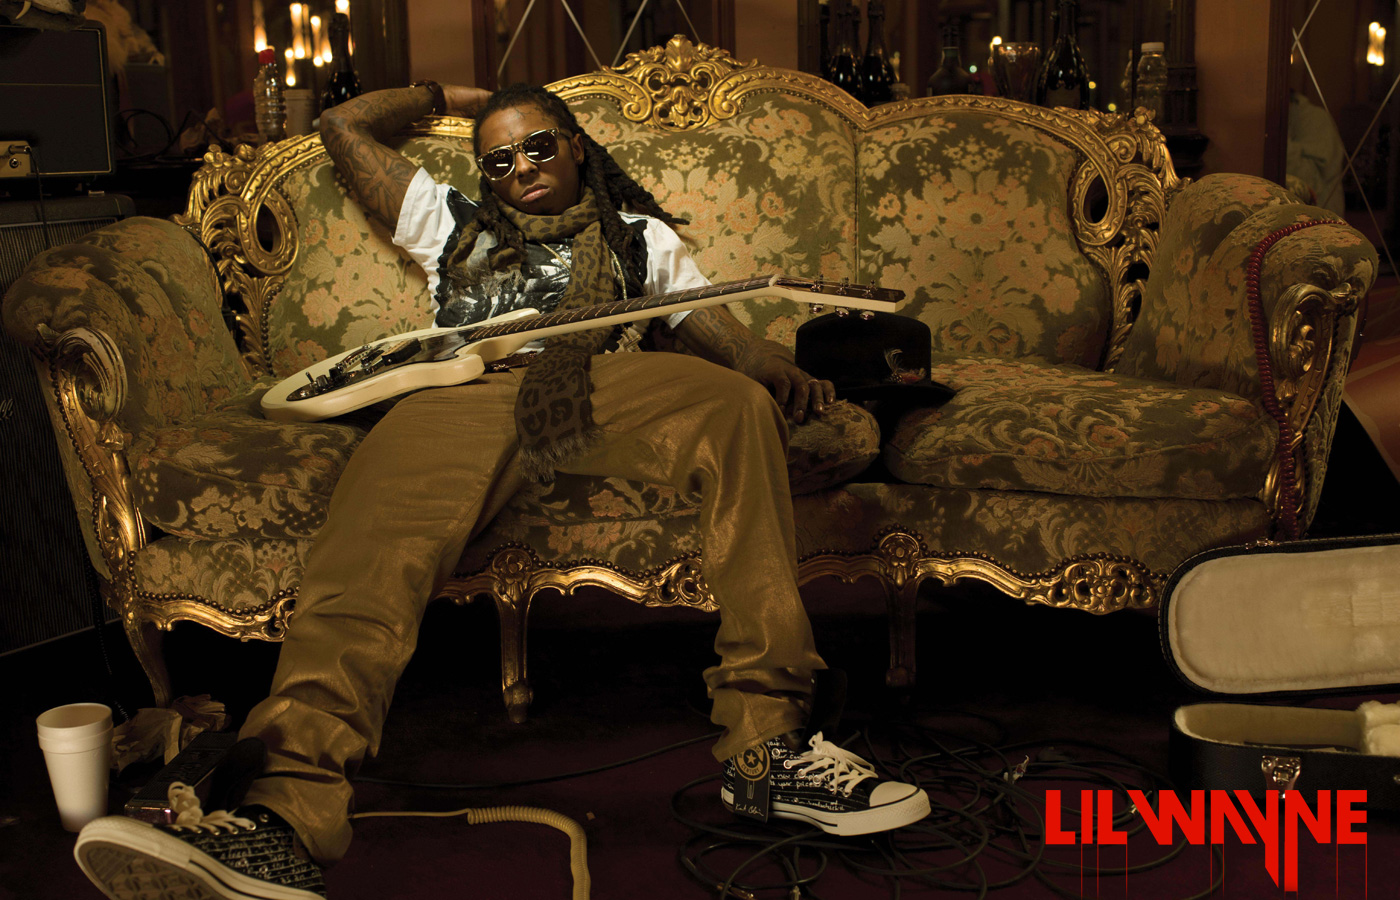 Lil Wayne Guitar Rap Wallpapers 1400x900